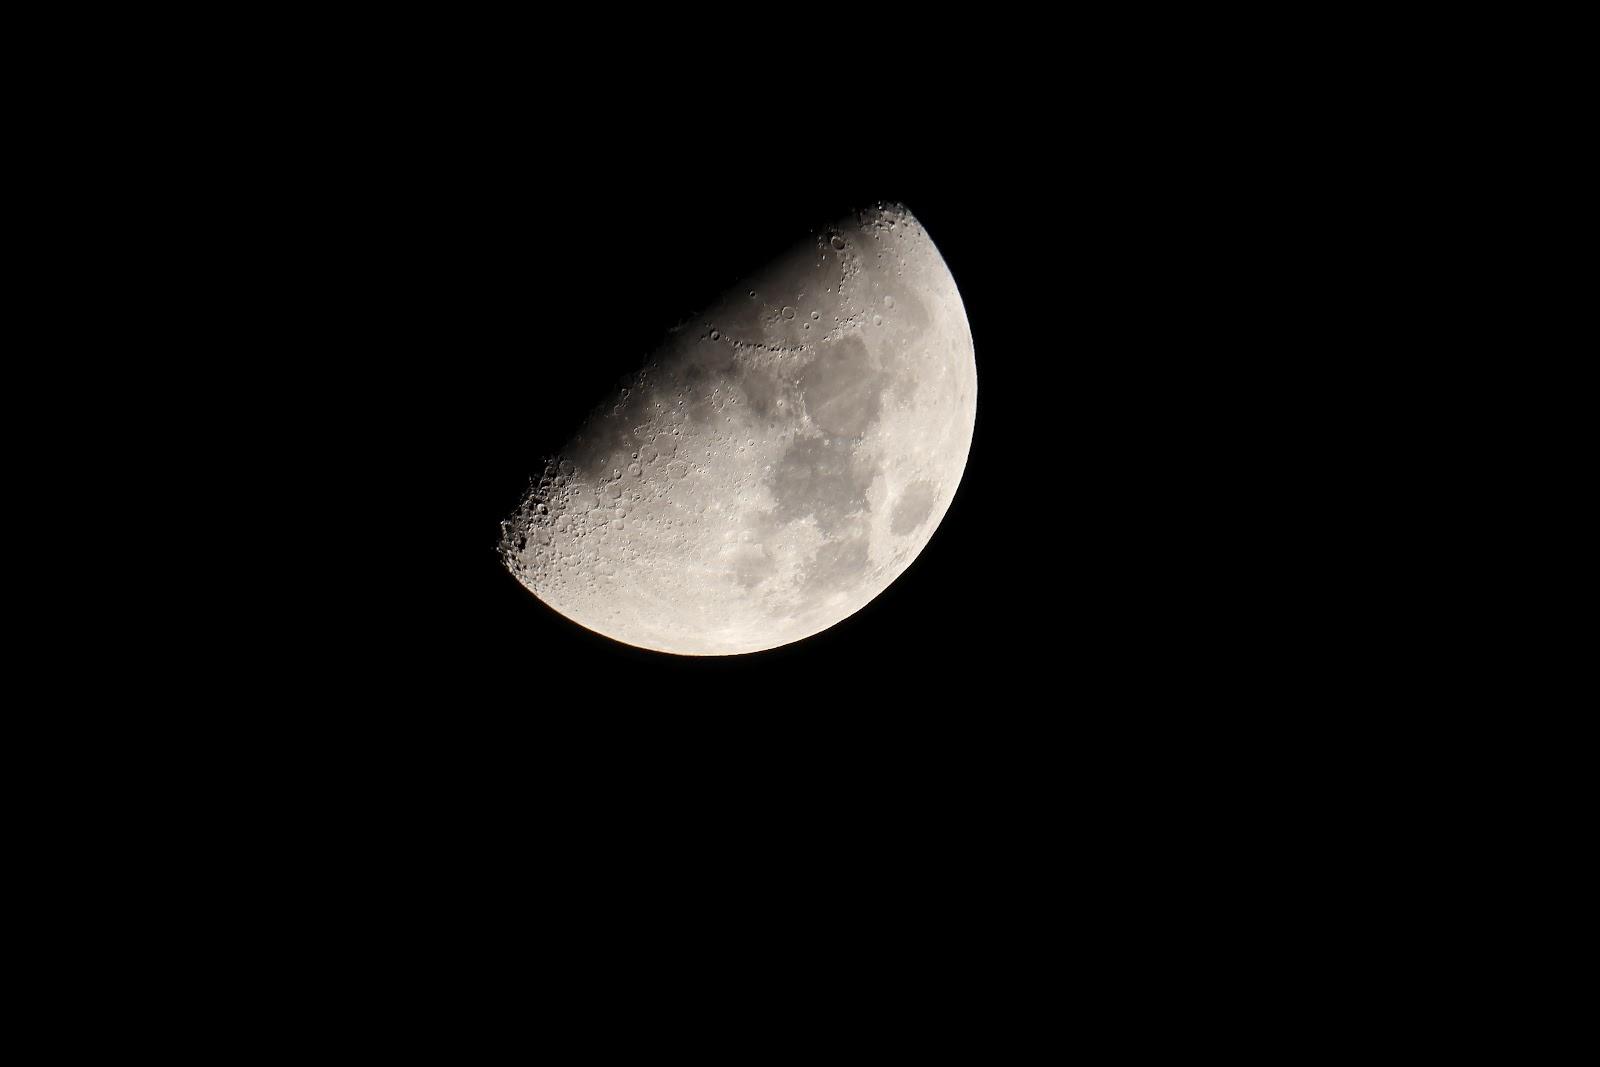 astrobagel first quarter moon 2012 june eos rebel g film manual canon eos rebel g manual download